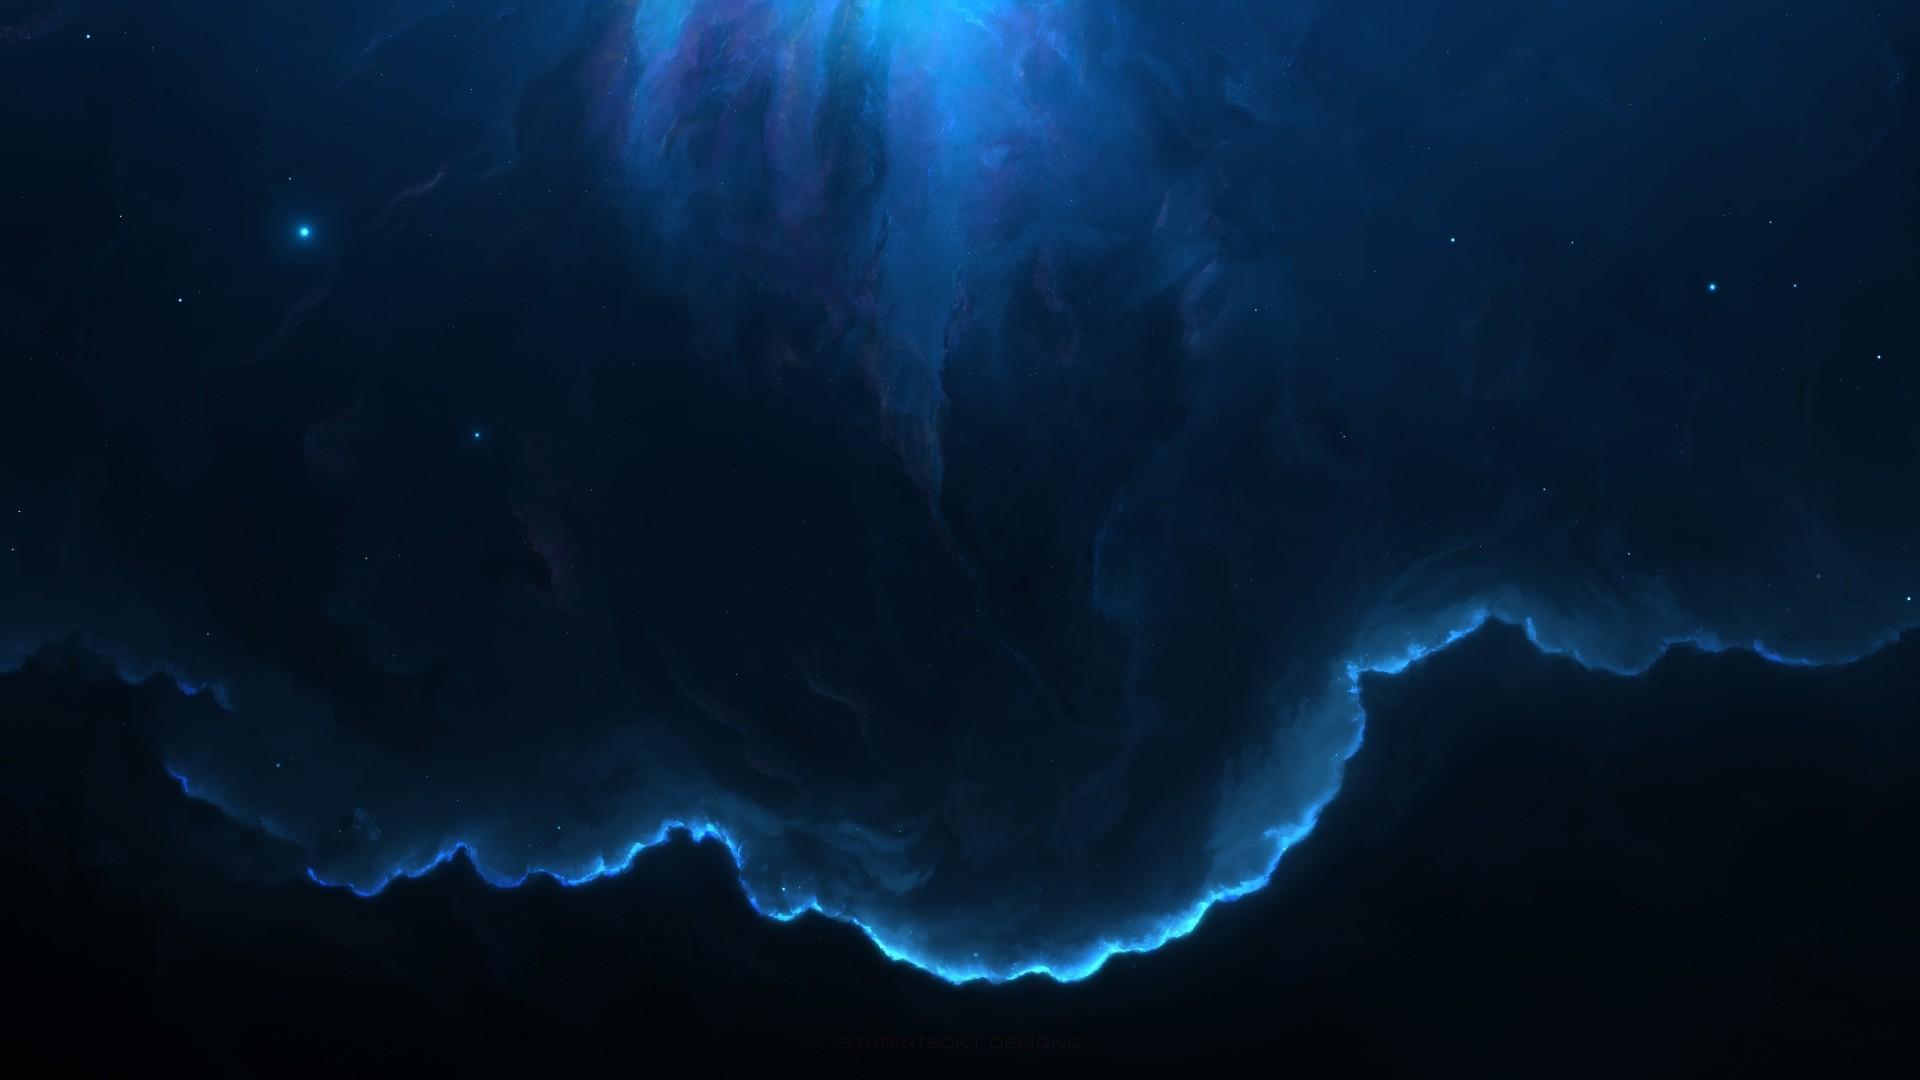 Dark Blue hd wallpaper download